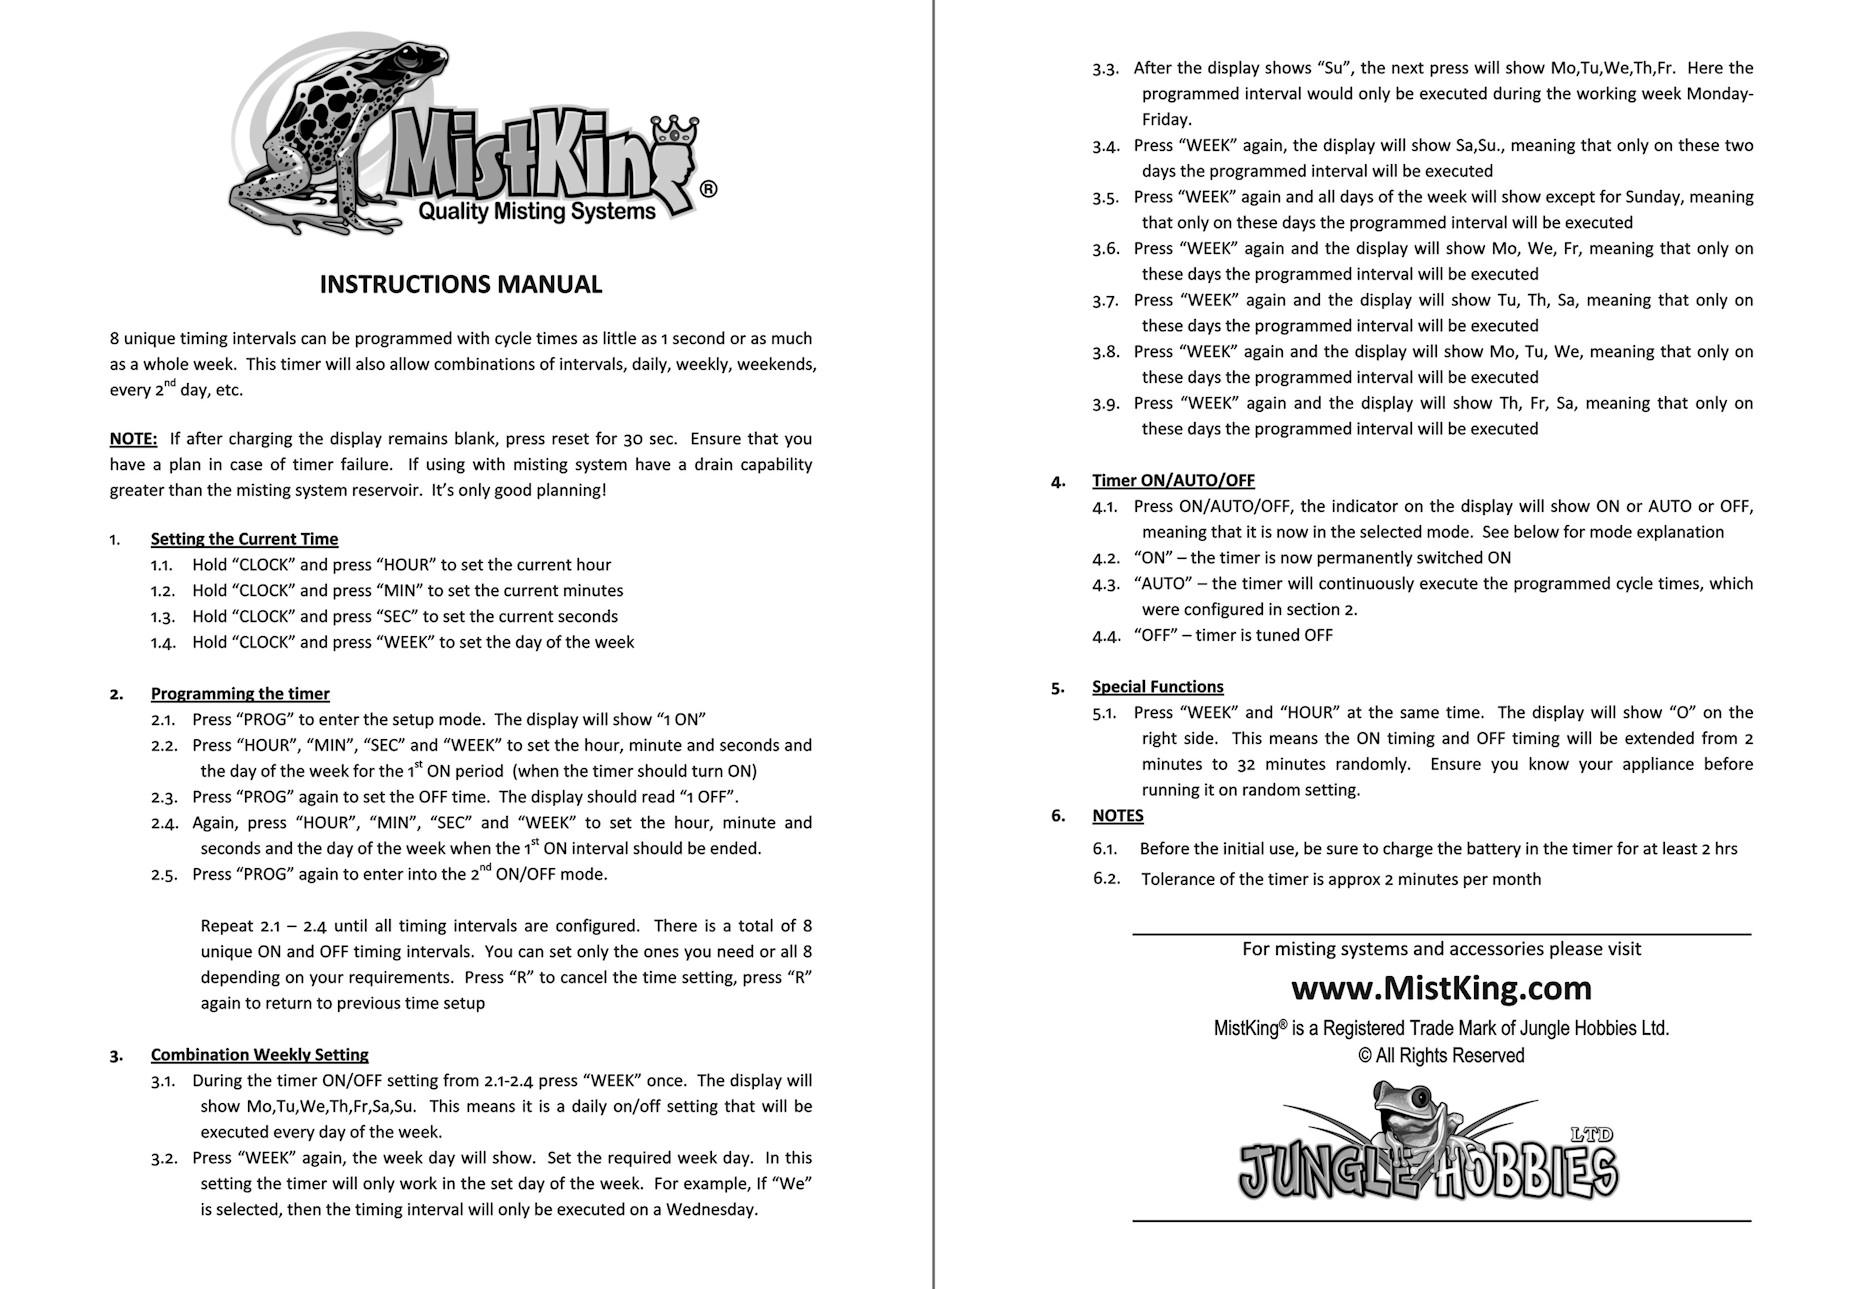 Mistking Instructions